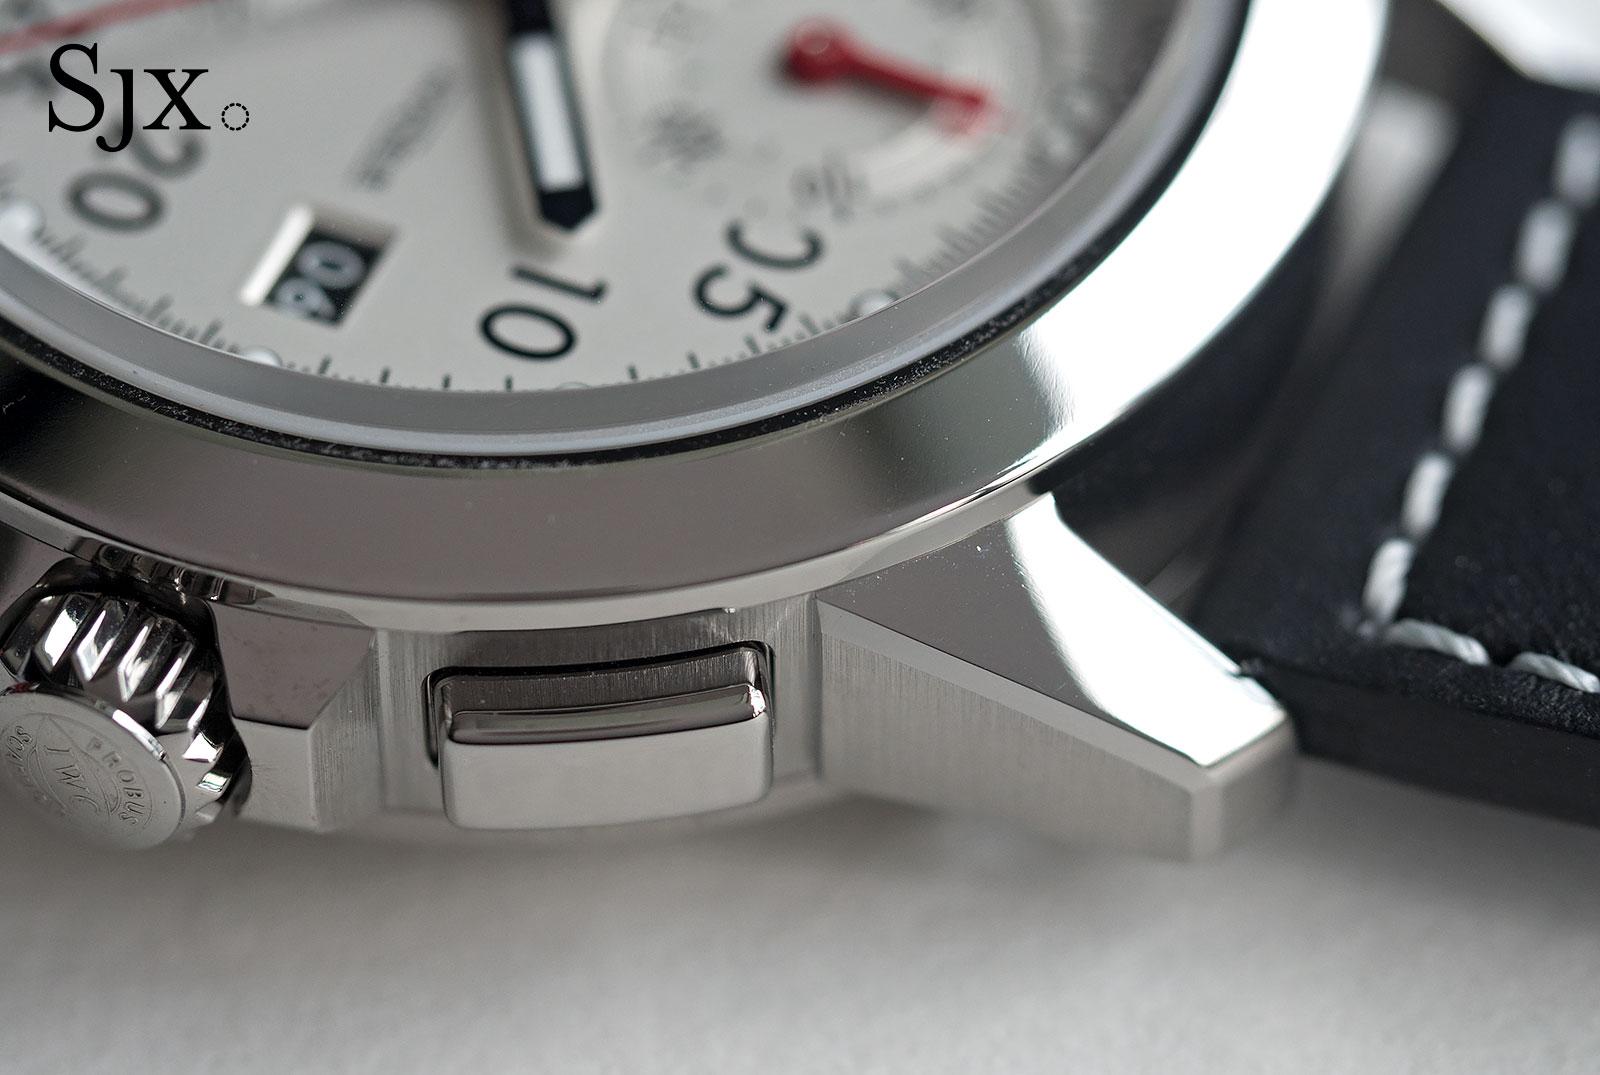 IWC Ingenieur Chronograph 50th Anniversary AMG 10